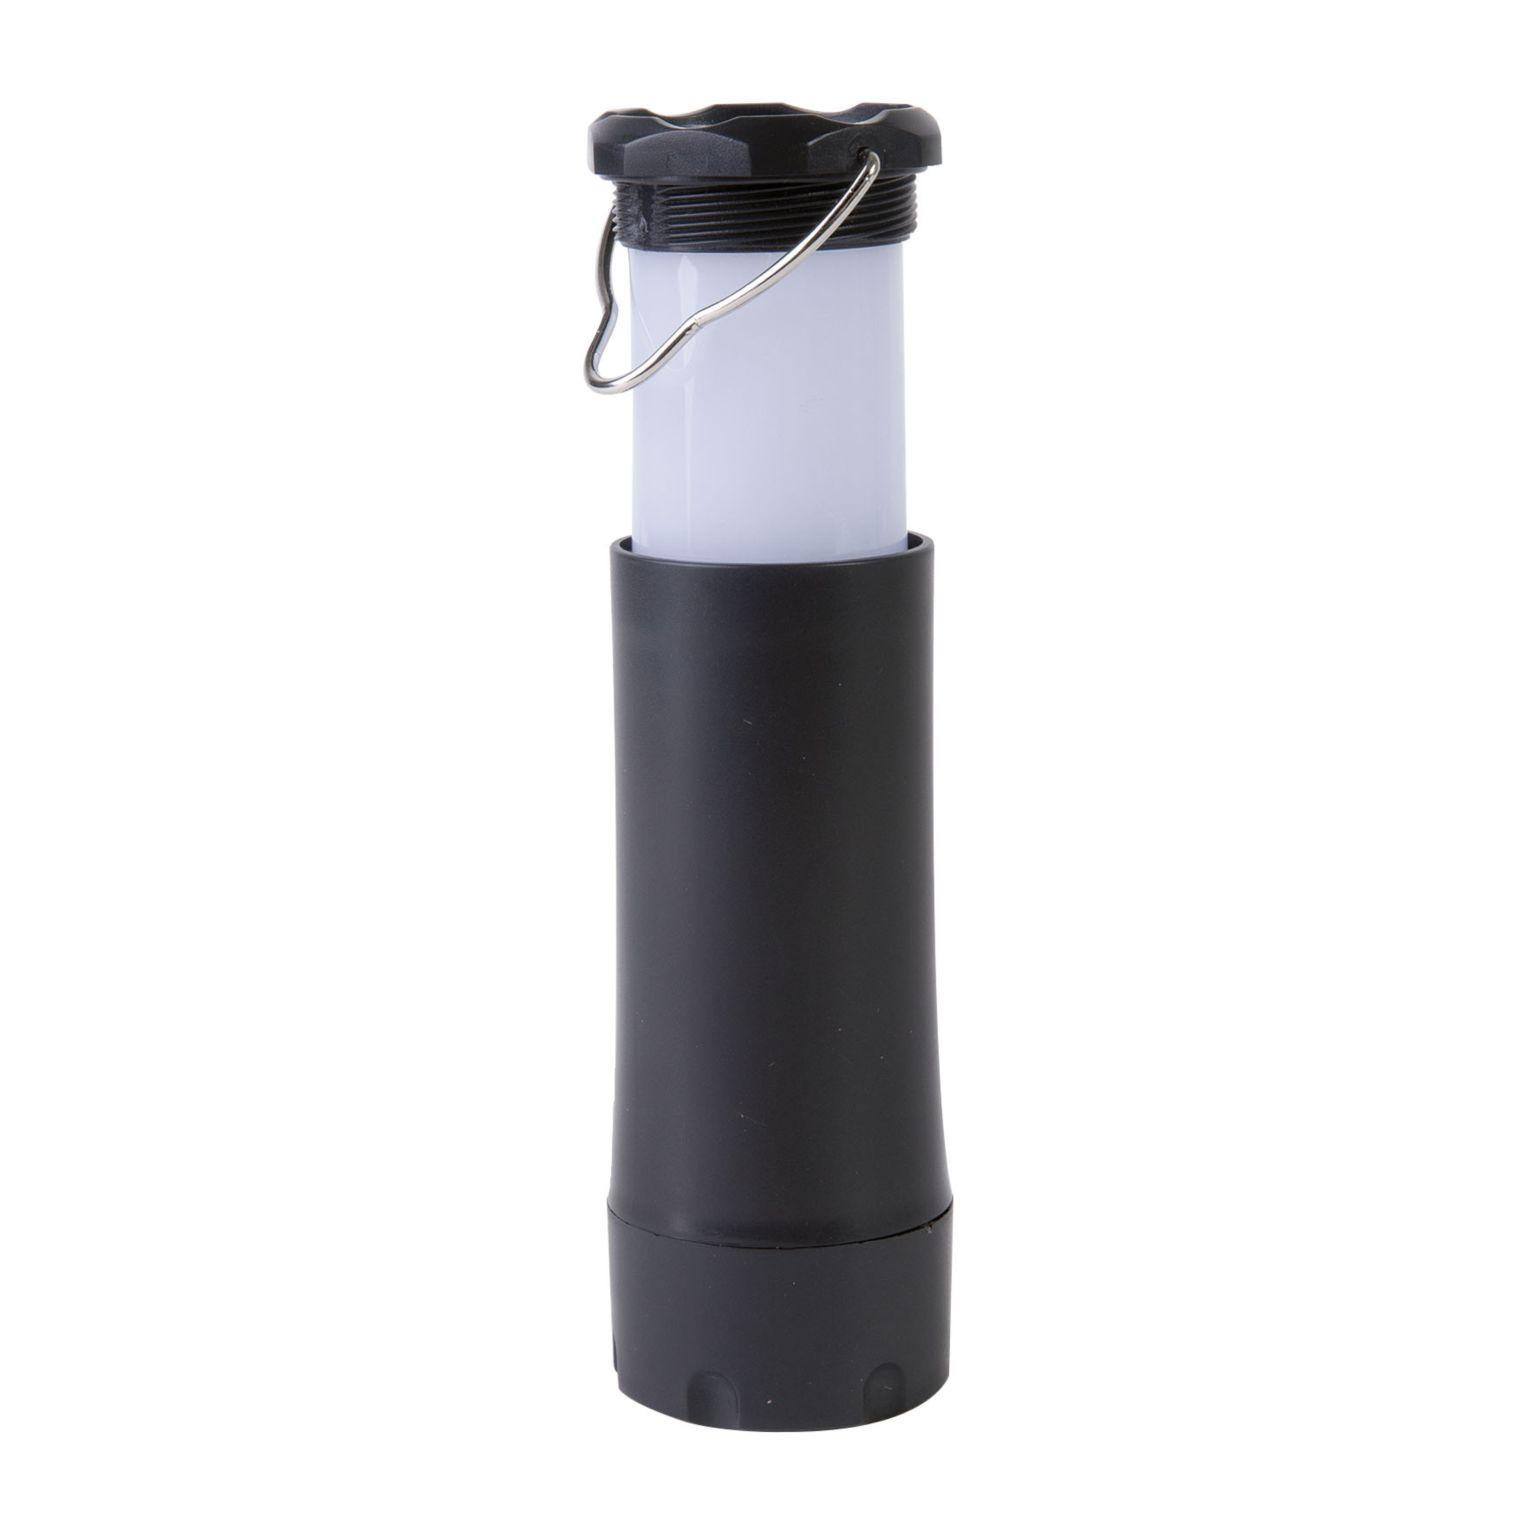 Lanterne/torche camping